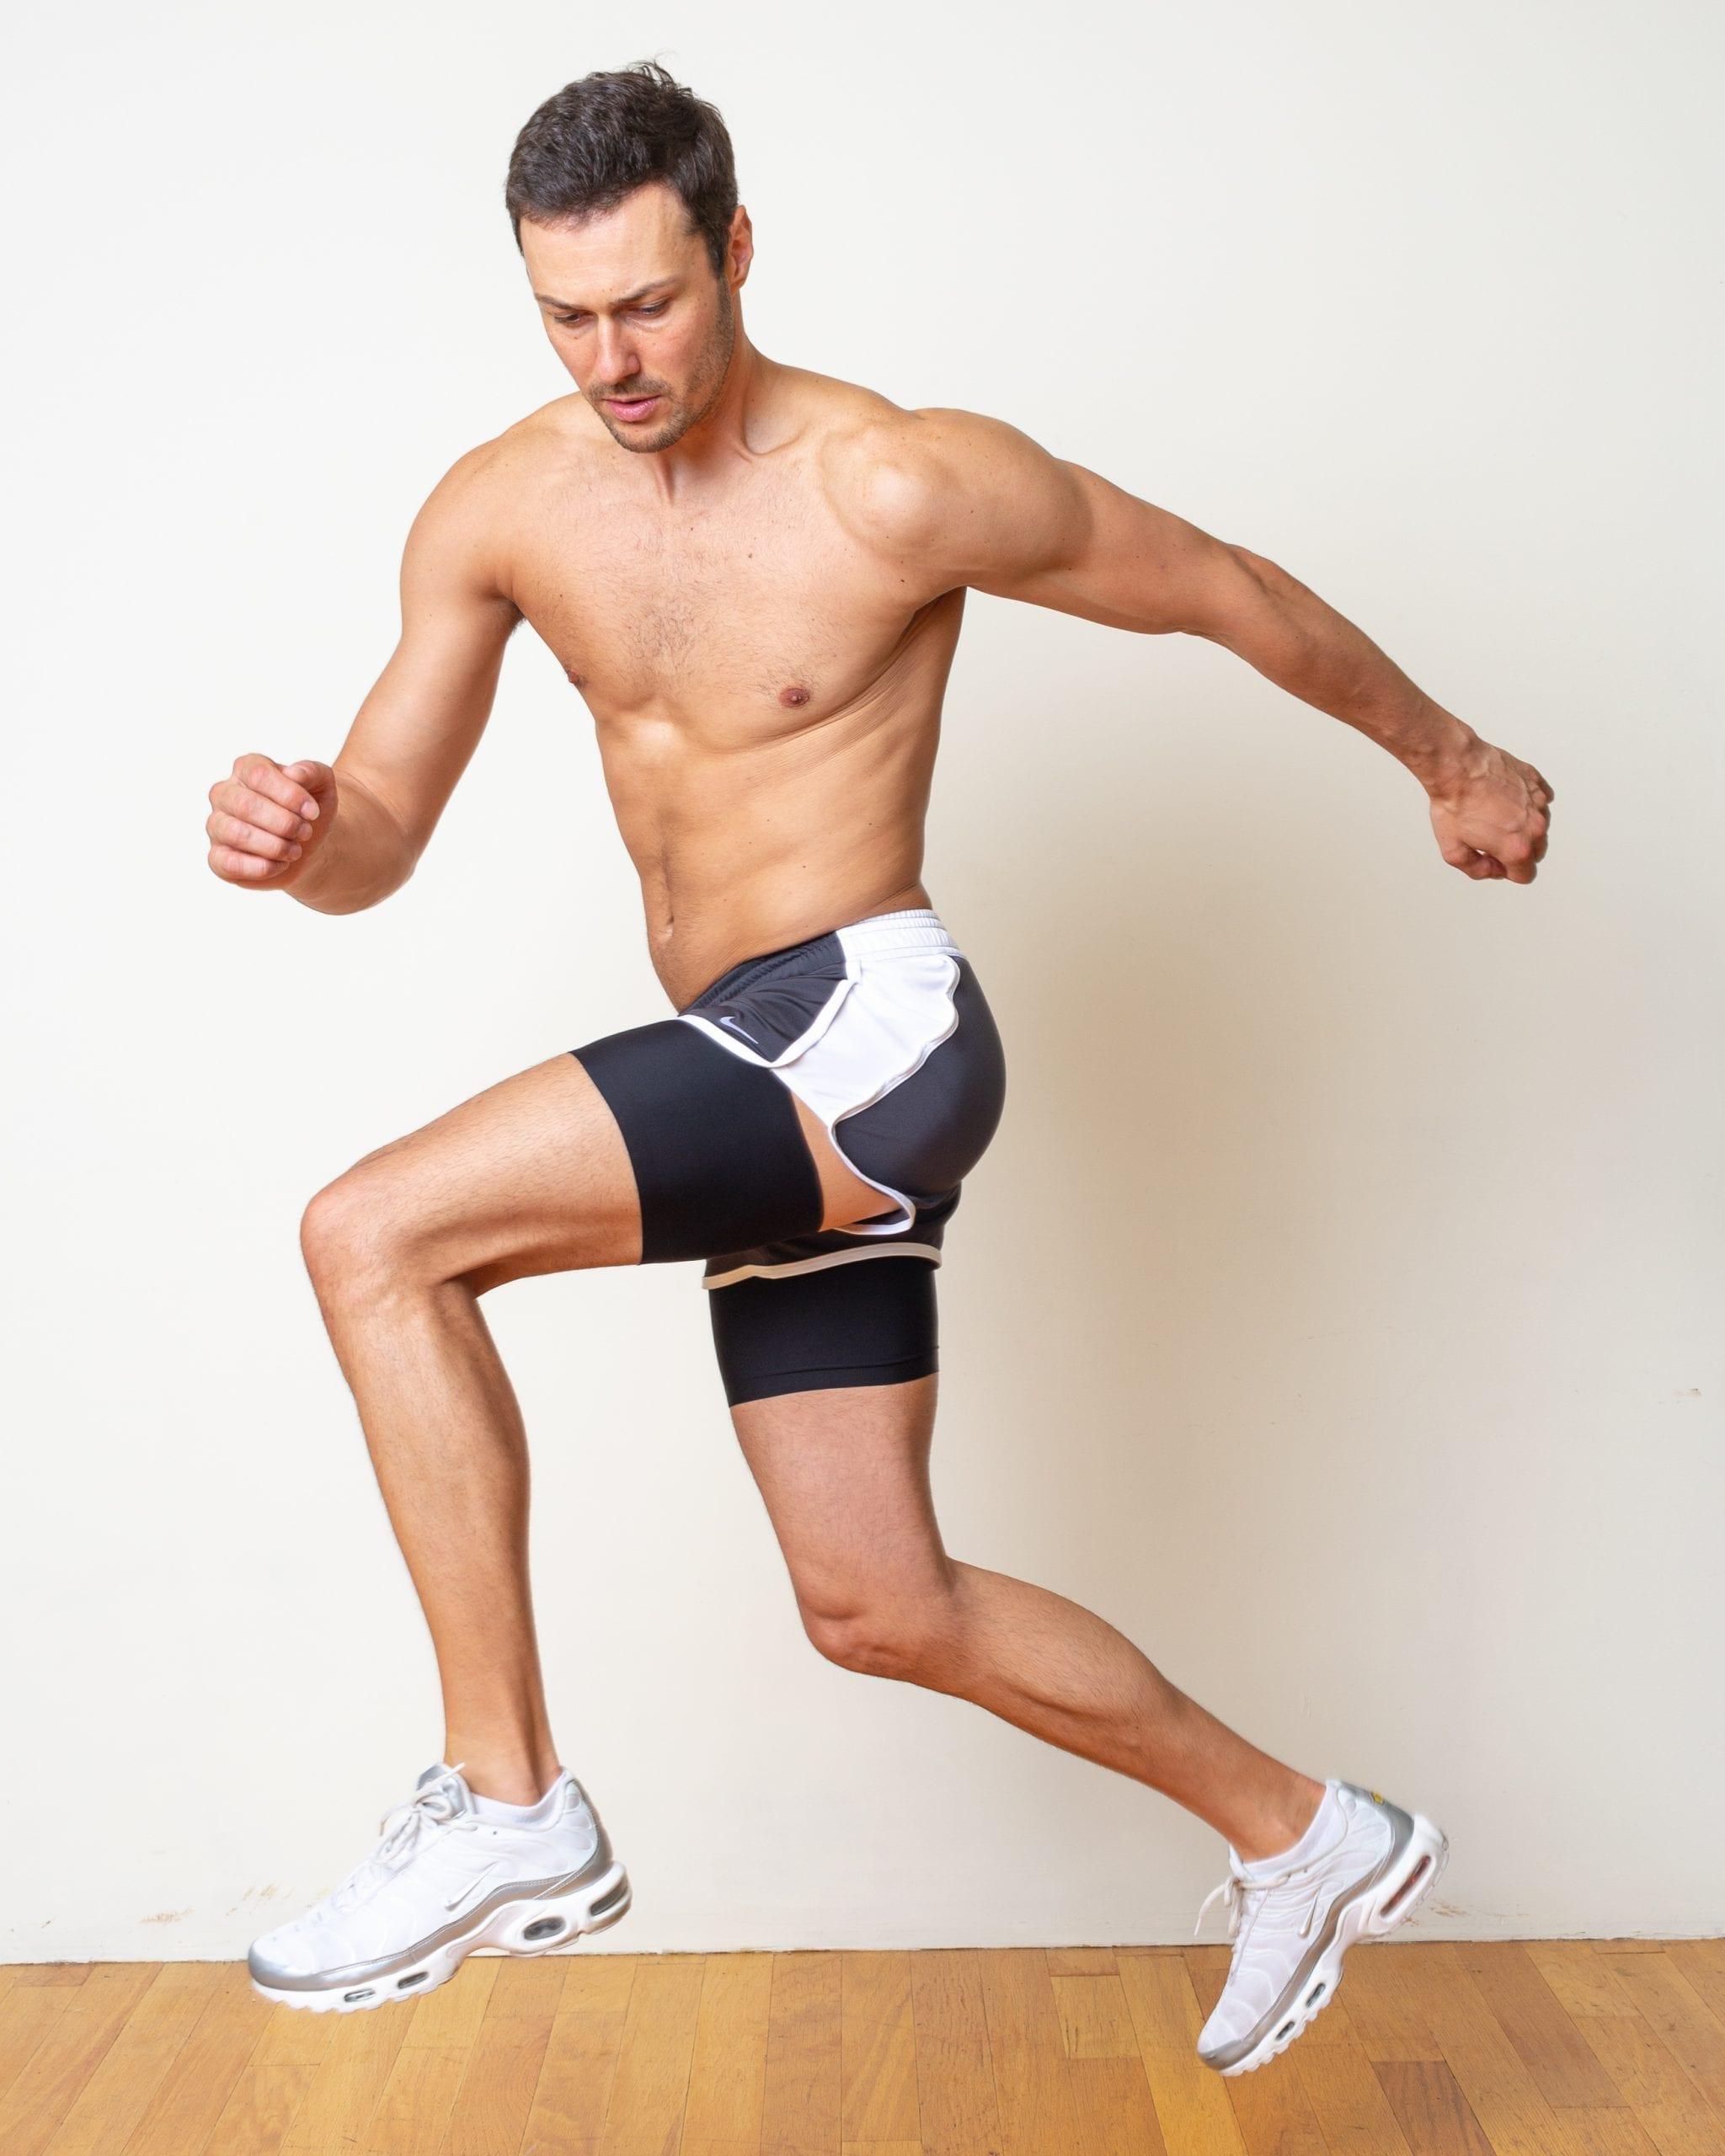 No thigh rubbing workout bands Bandelettes